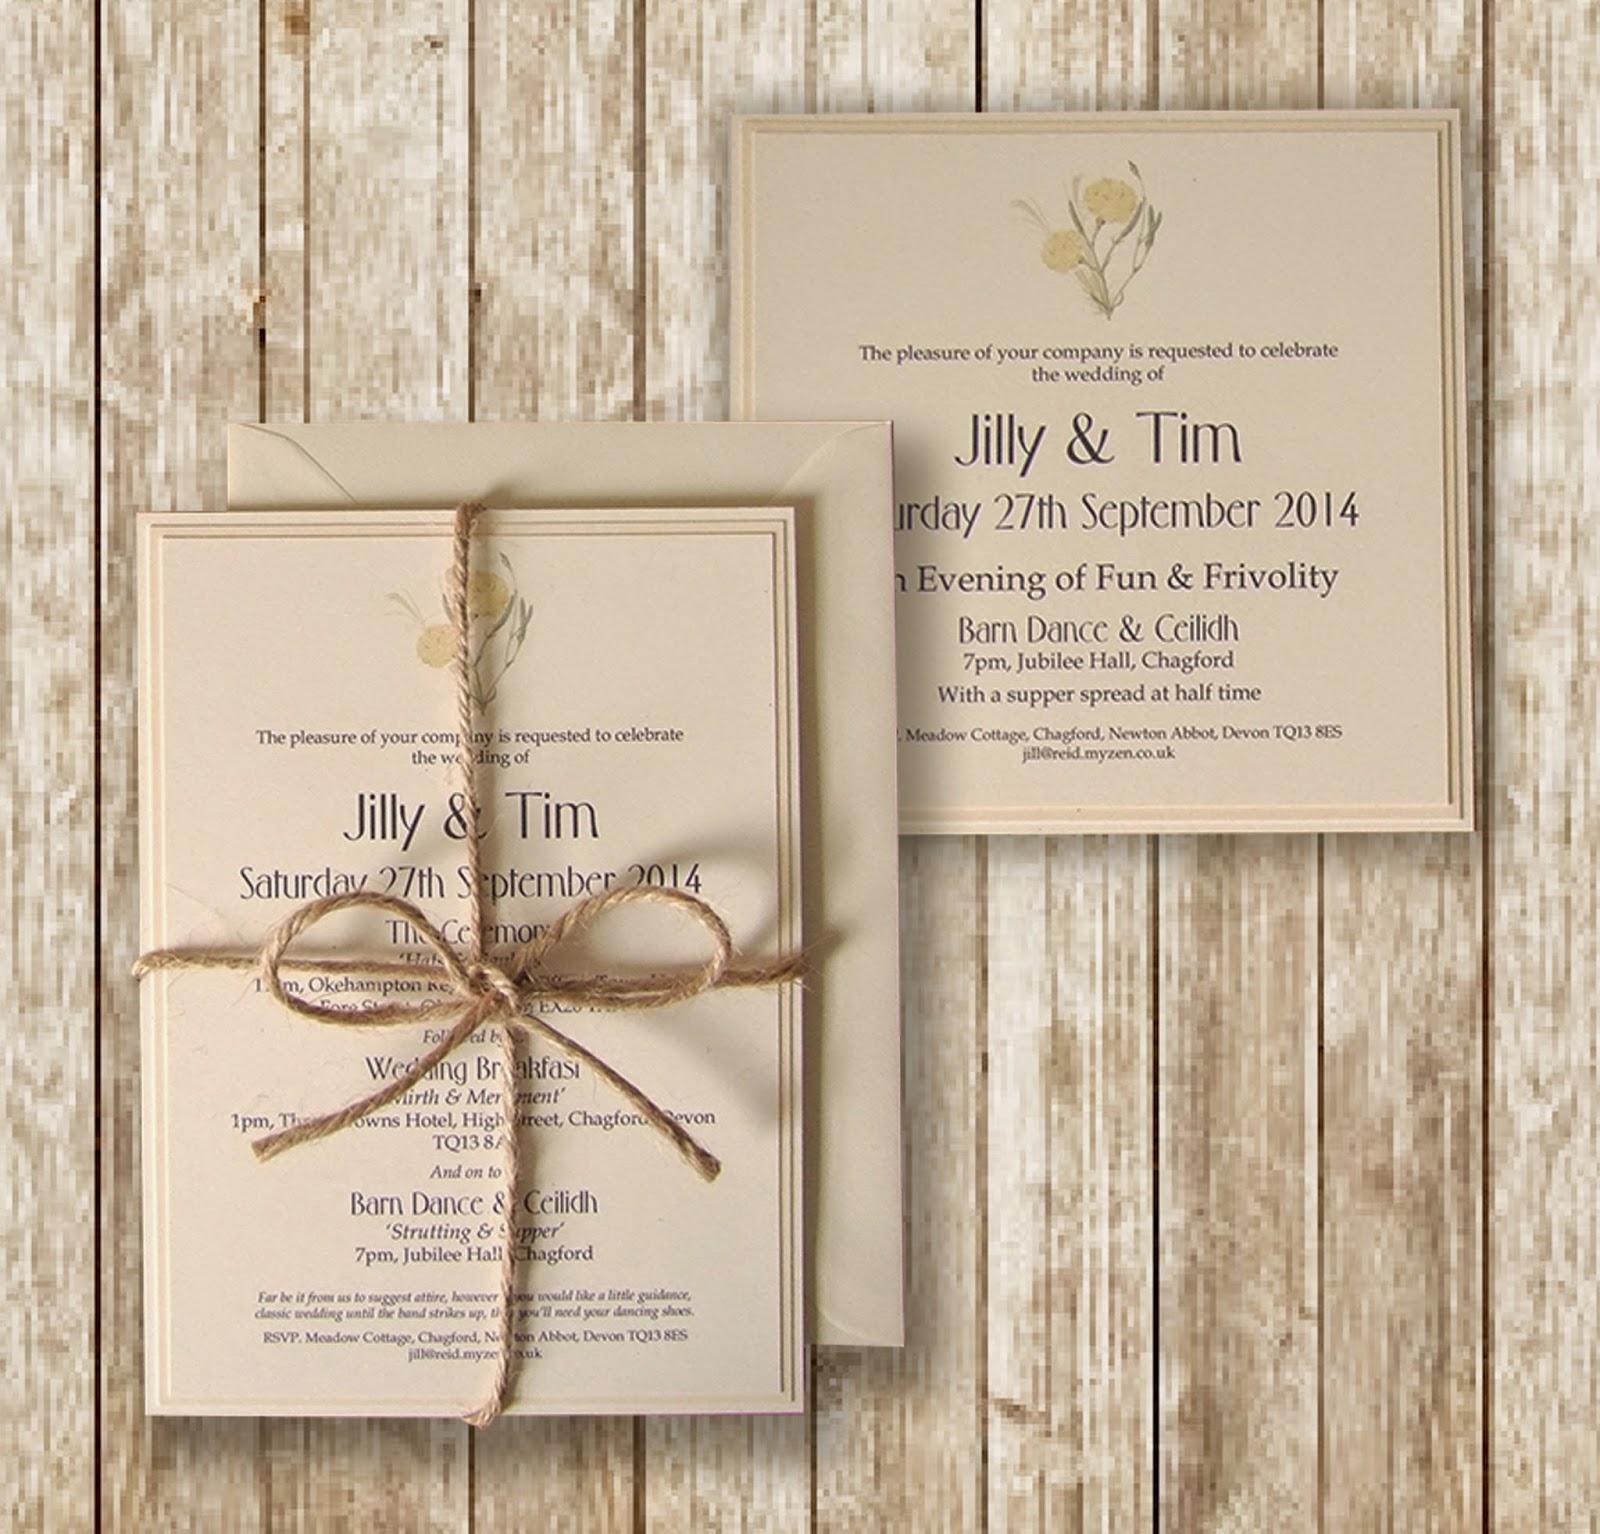 Knots And Kisses Wedding Stationery Rustic Lemon Cream Invitations Inspiration Weddbook